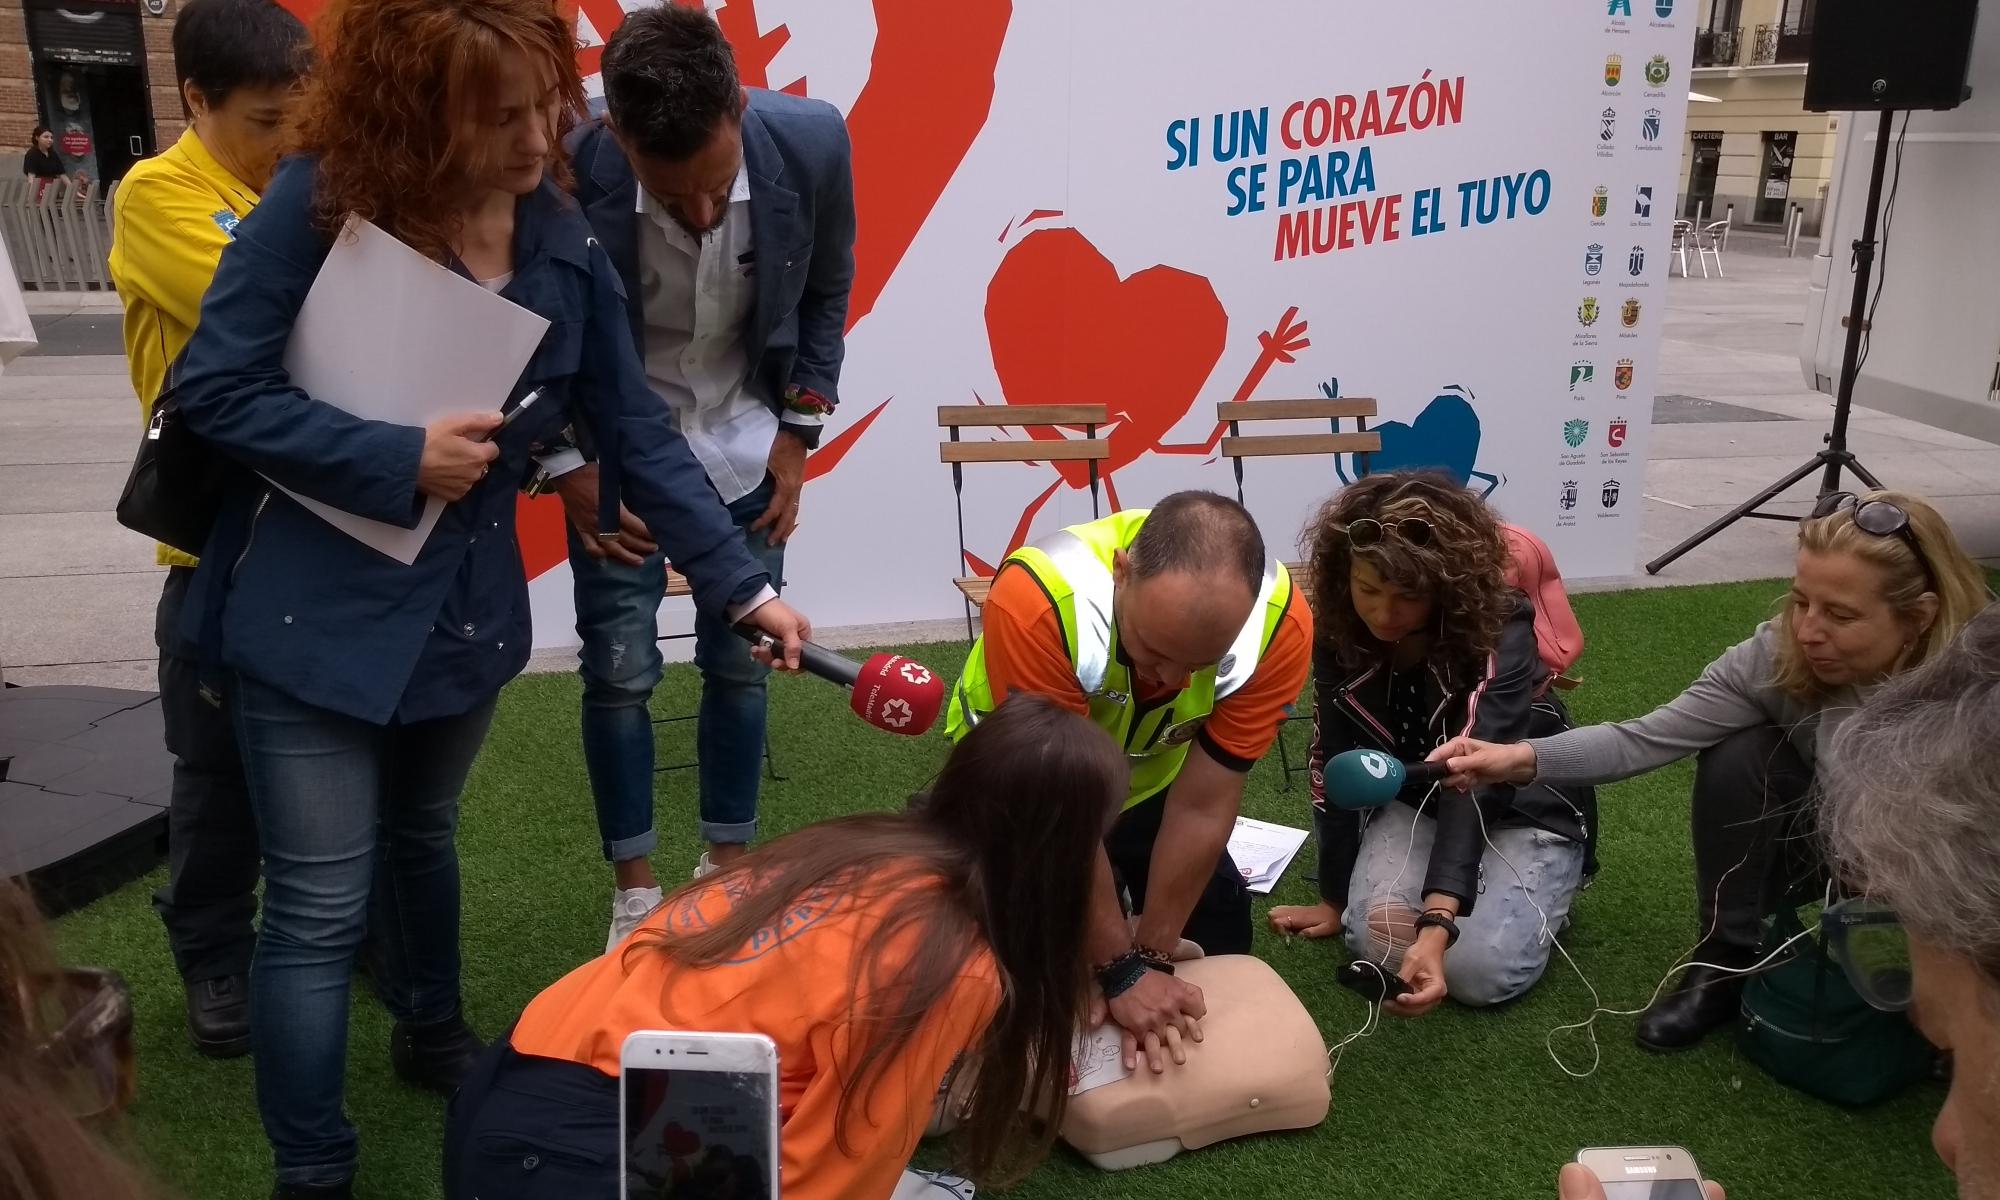 Foro de programa Late Madrid y cardioMad